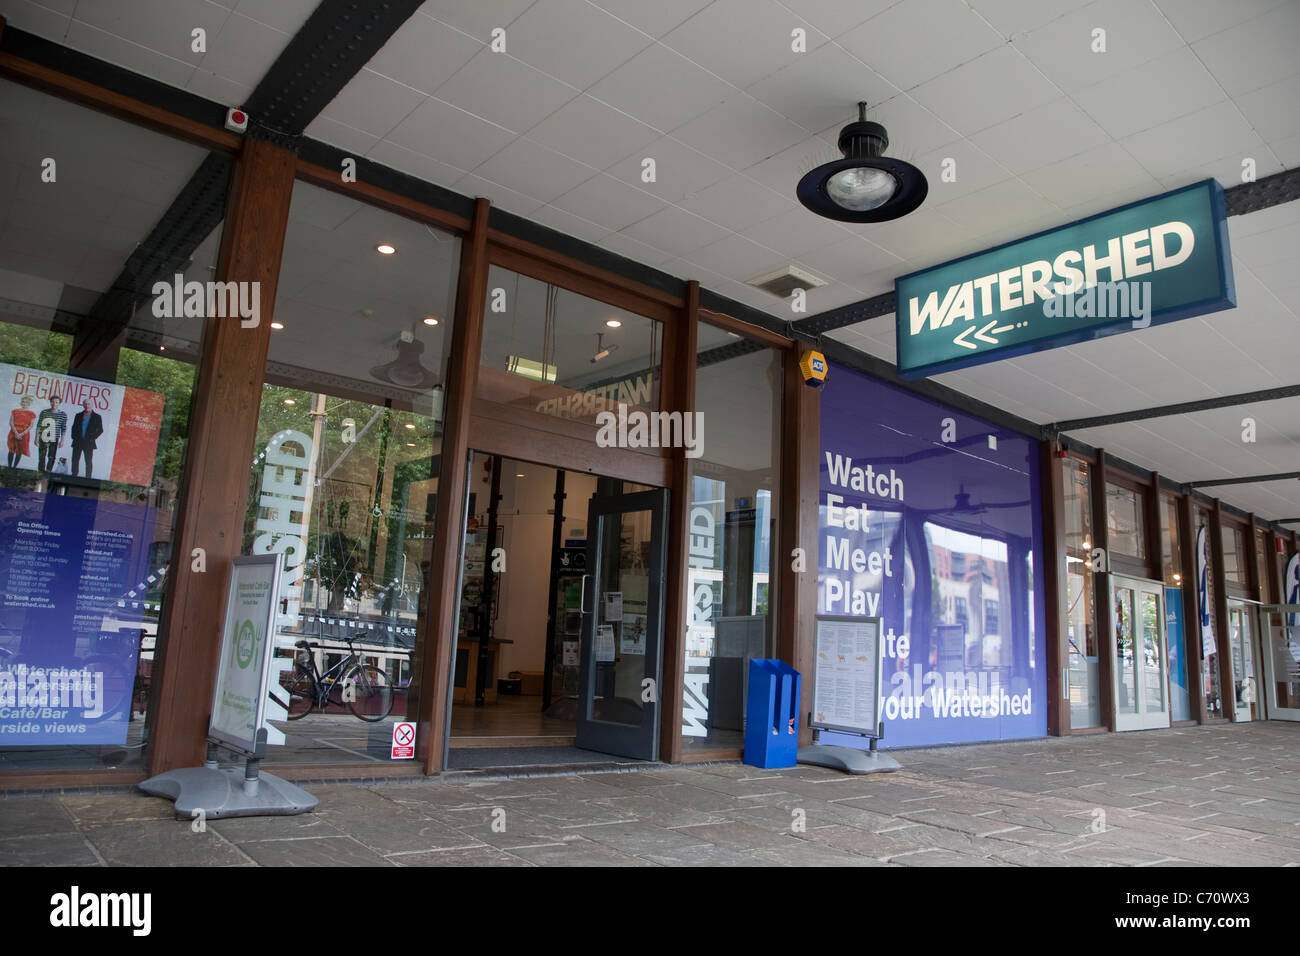 Watershed Cinema, Bristol, England, UK - Stock Image